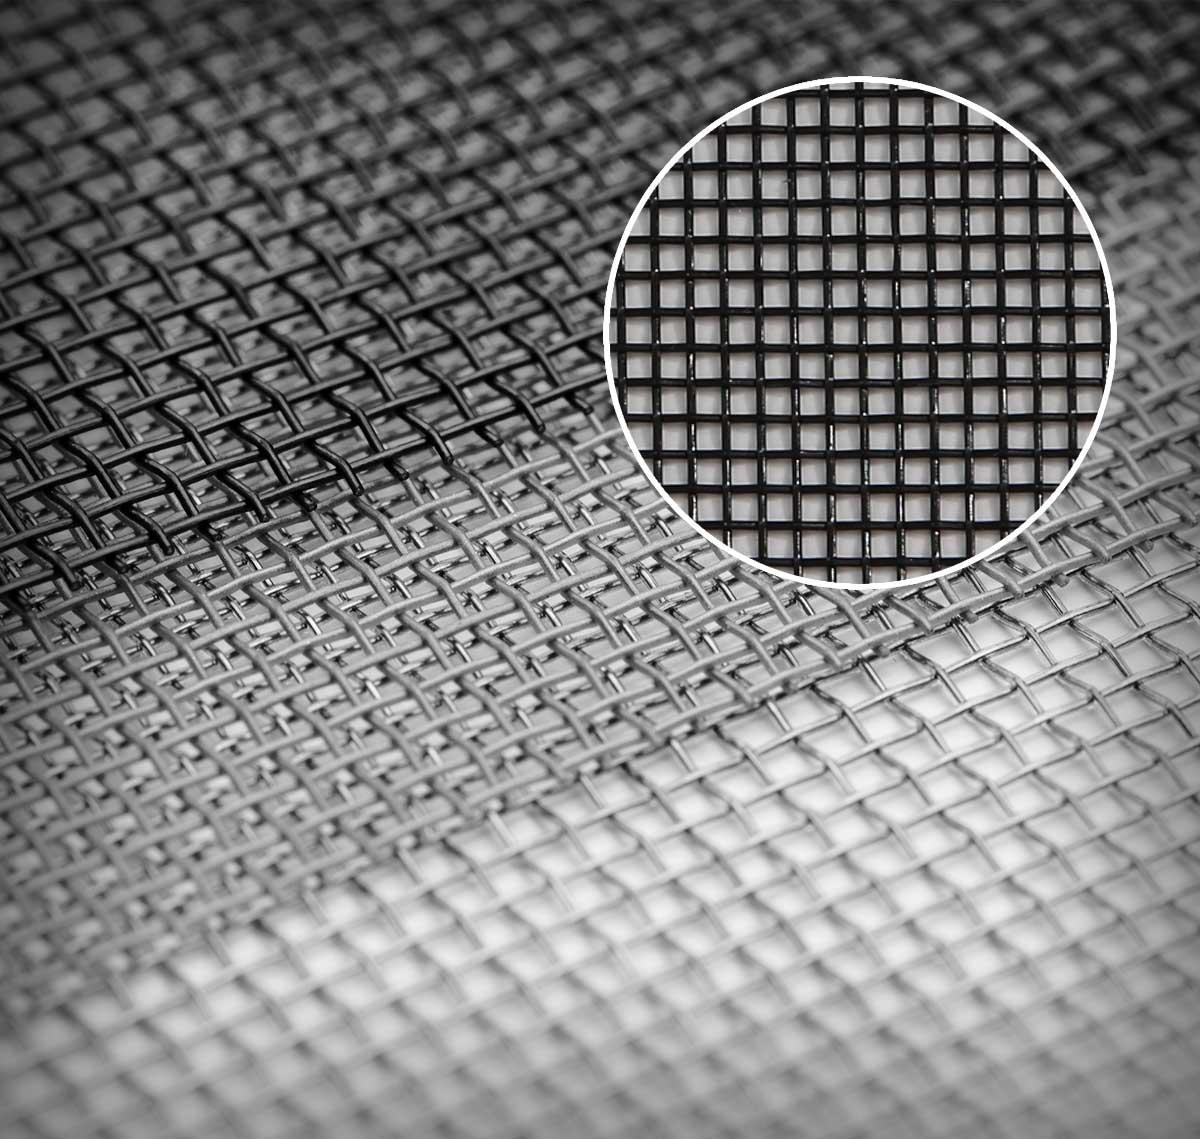 Stainless Steel Woven Wire Mesh Archives - Jiten Plastics Pleated ...